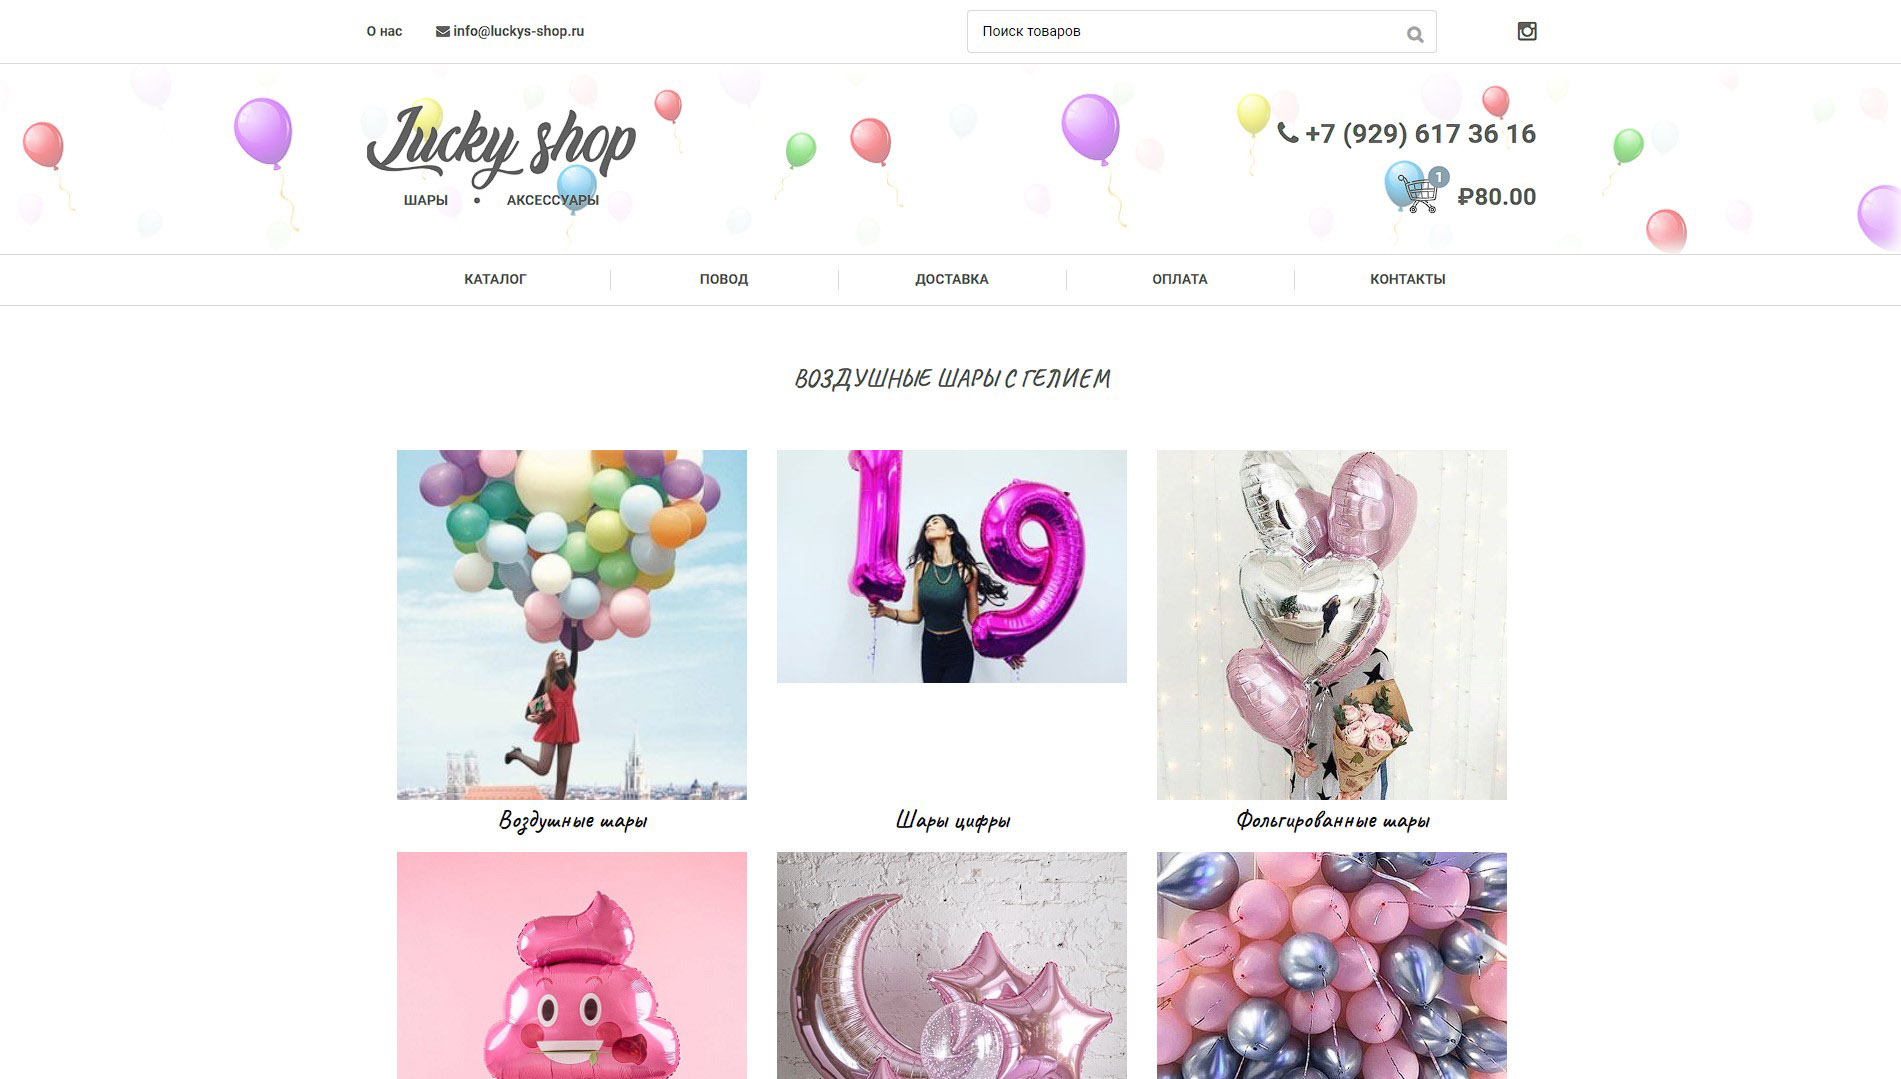 Интернет-магазин Лаки шоп